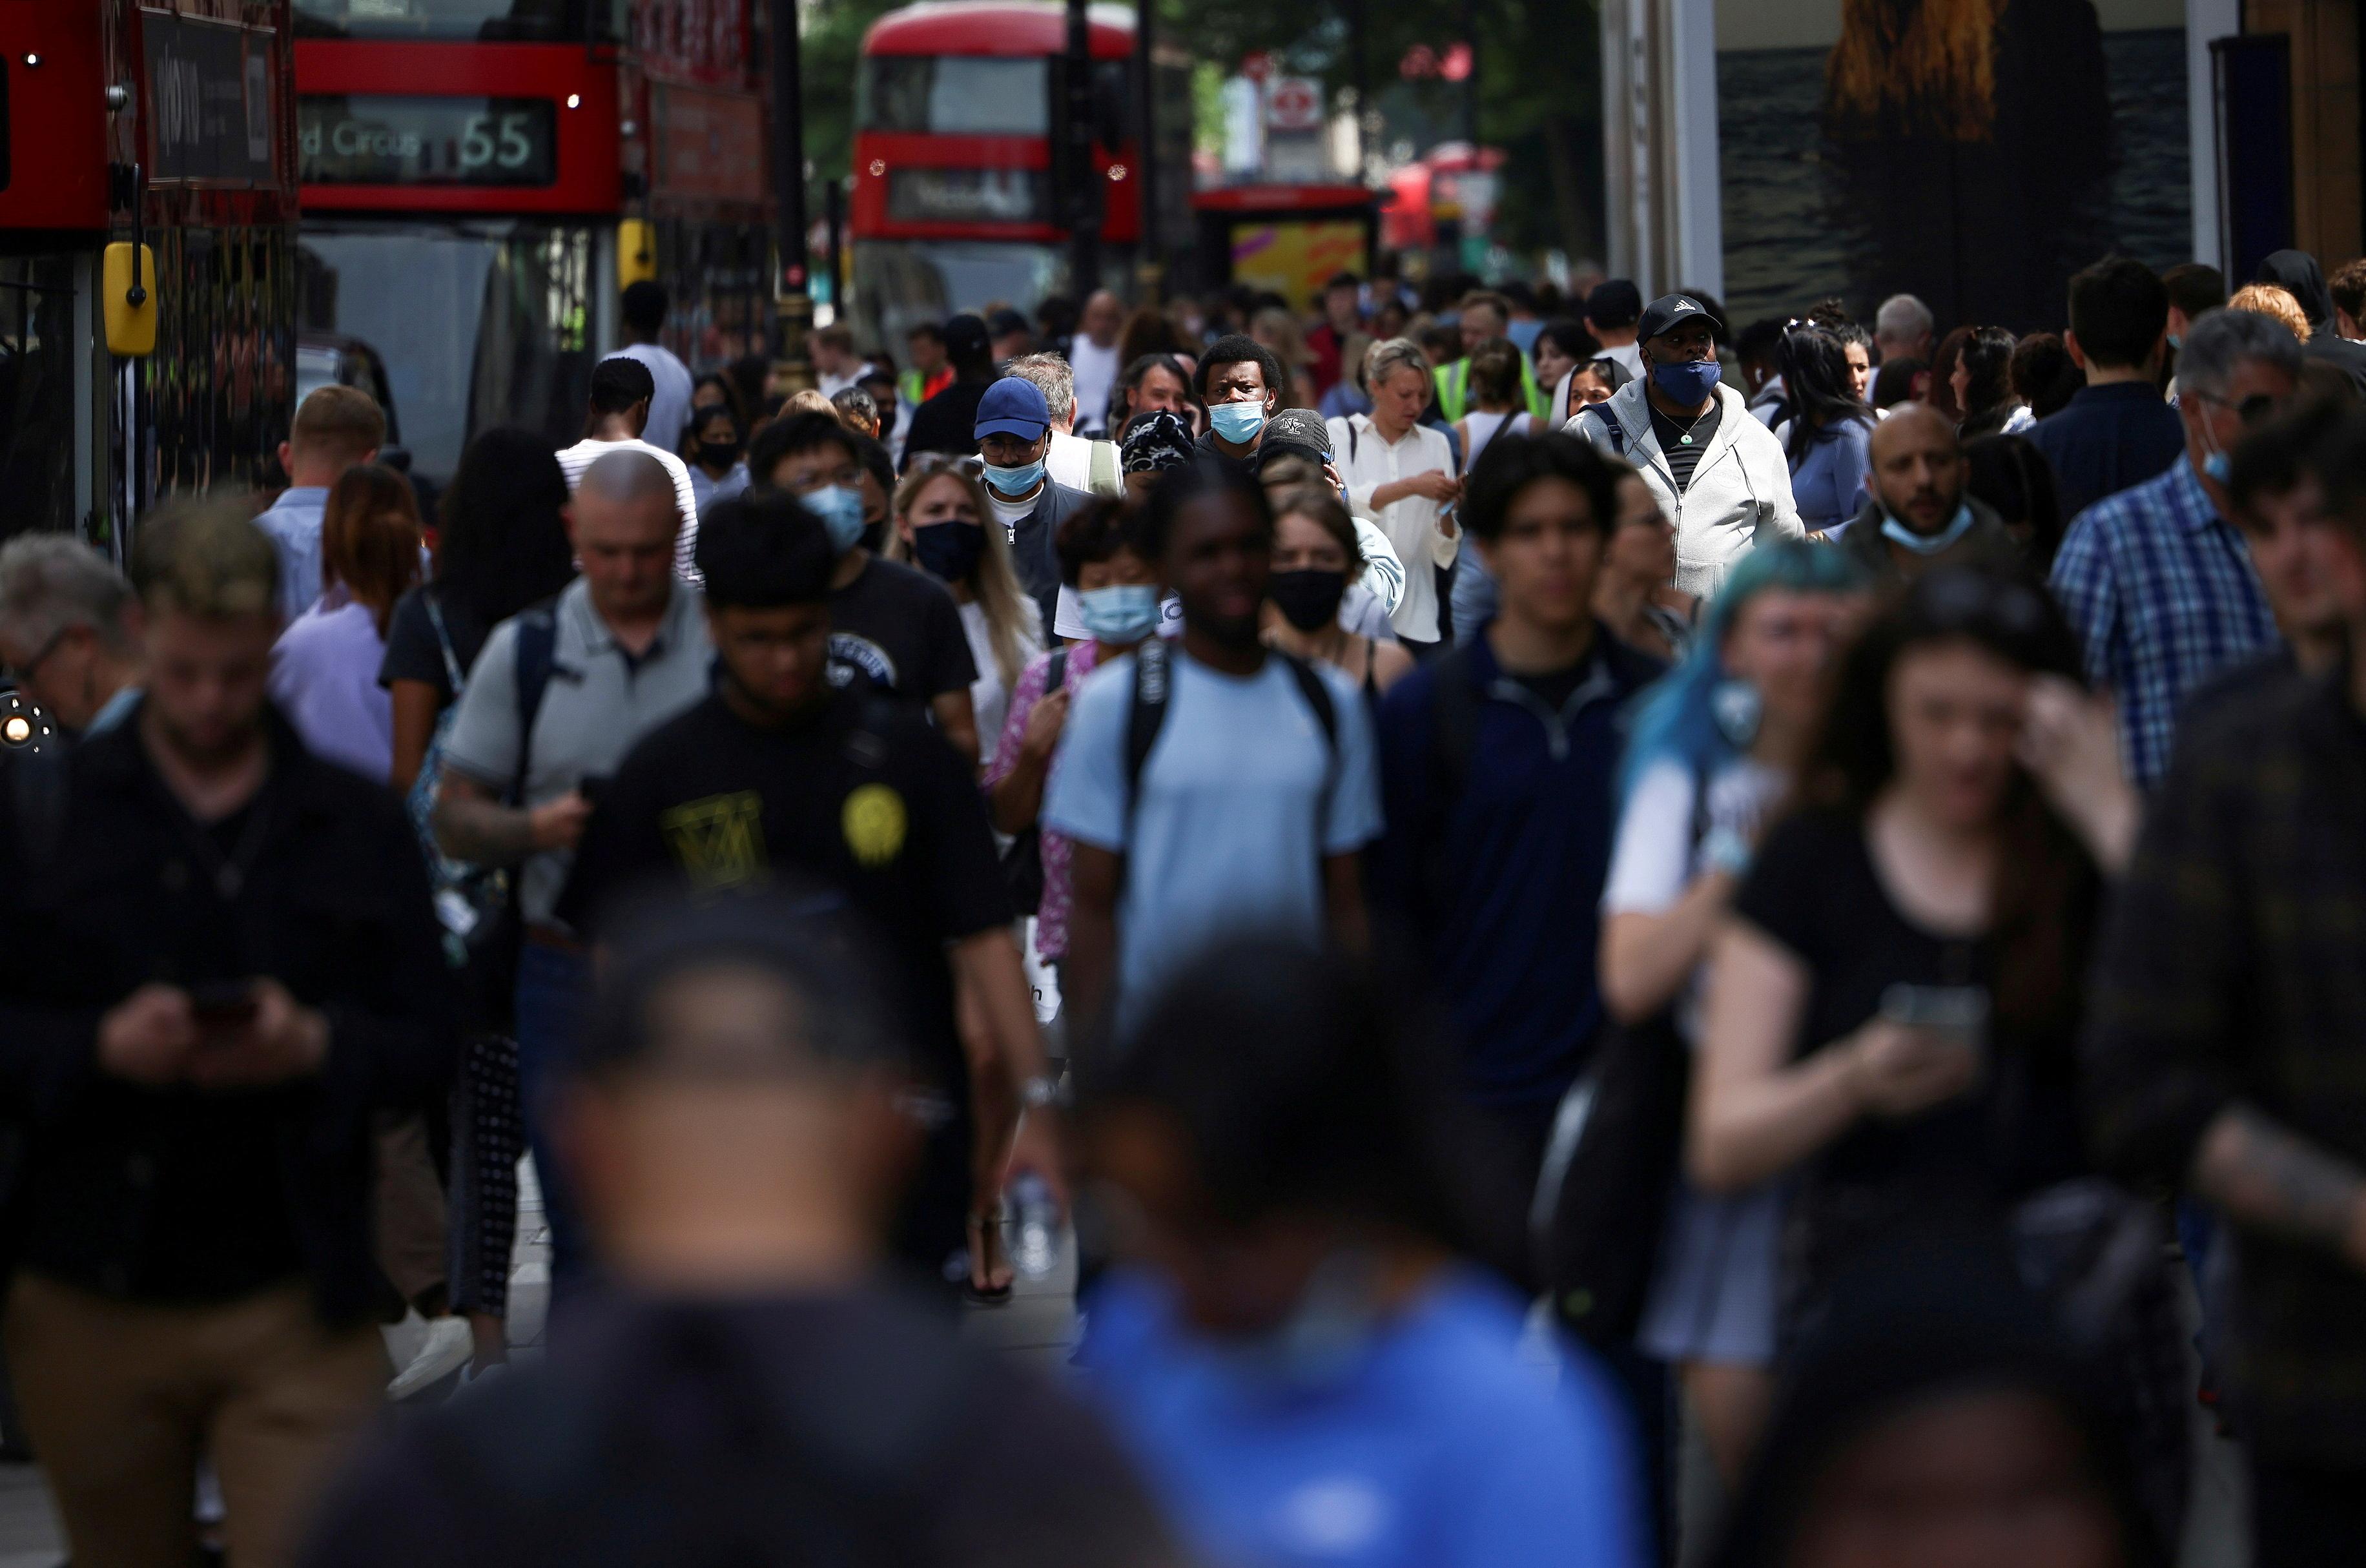 People walk along Oxford Street, amid the coronavirus disease (COVID-19) outbreak, in London, Britain, July 26, 2021. REUTERS/Henry Nicholls/File Photo